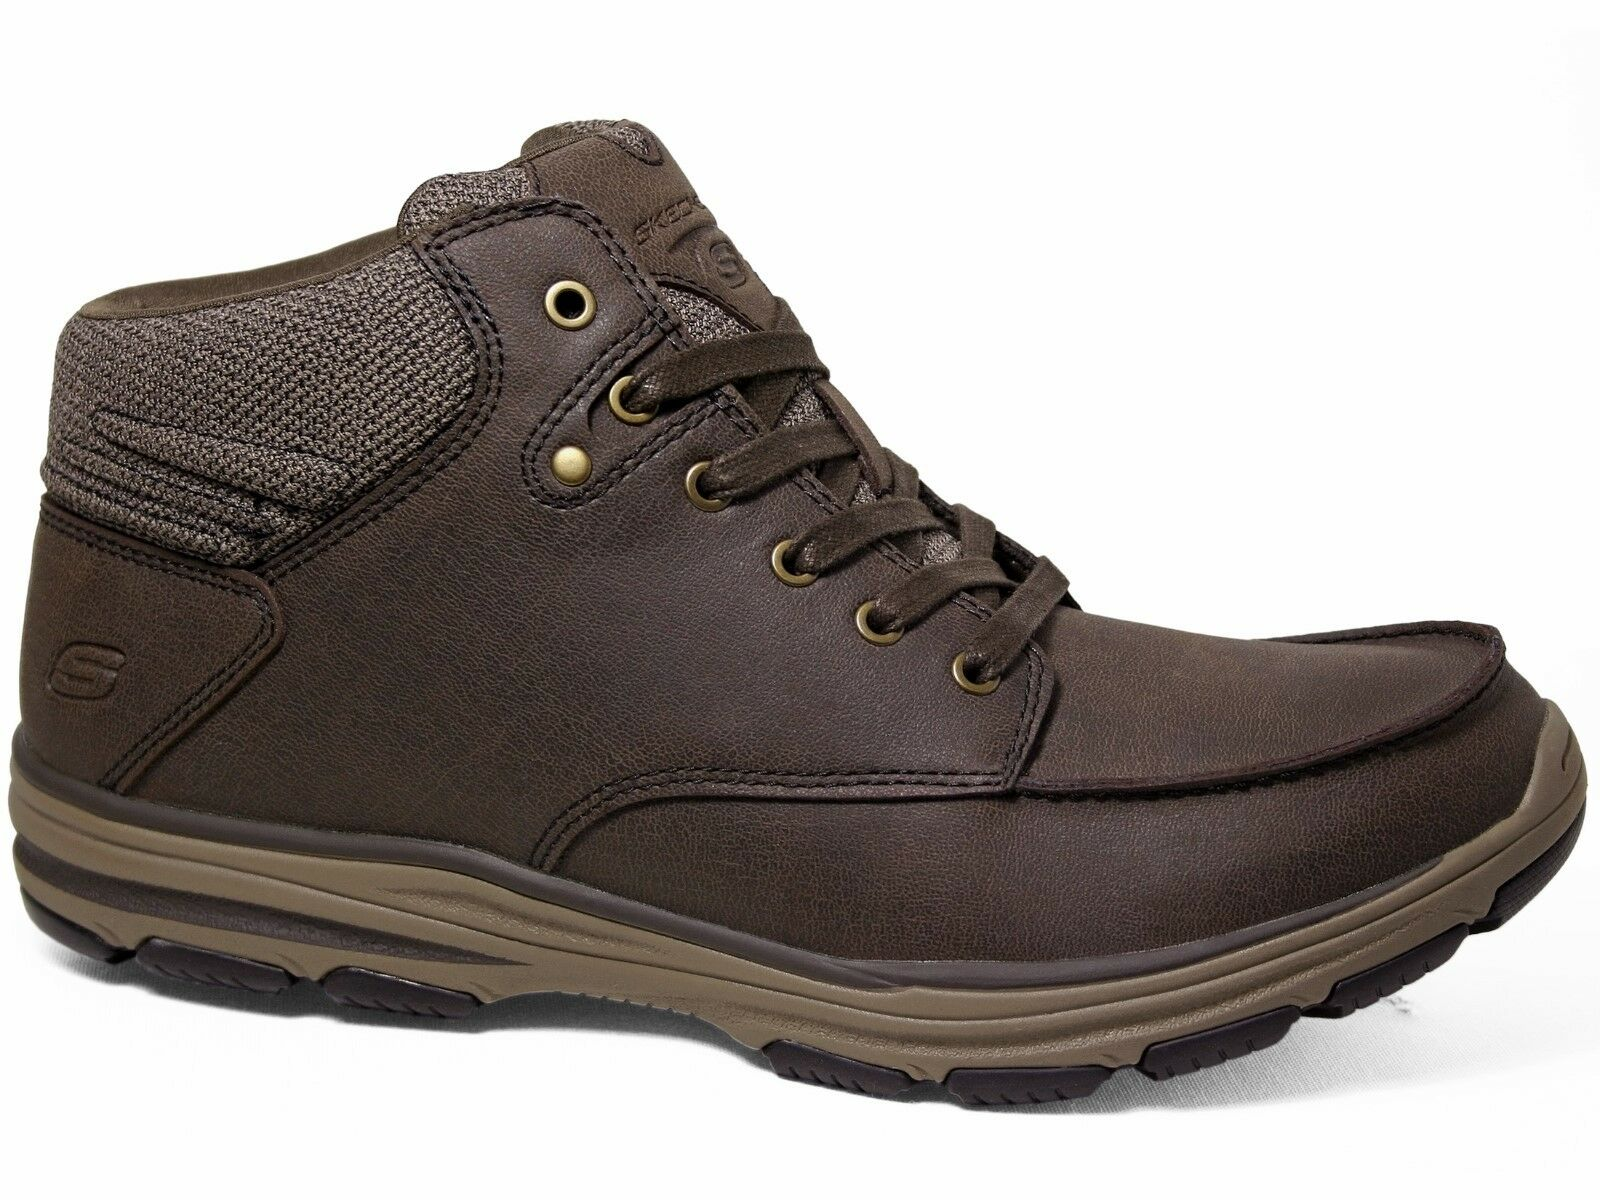 Skechers Skech-Air Garton Meleno Suede Boots Chocolate / Braun 65170/CHOC